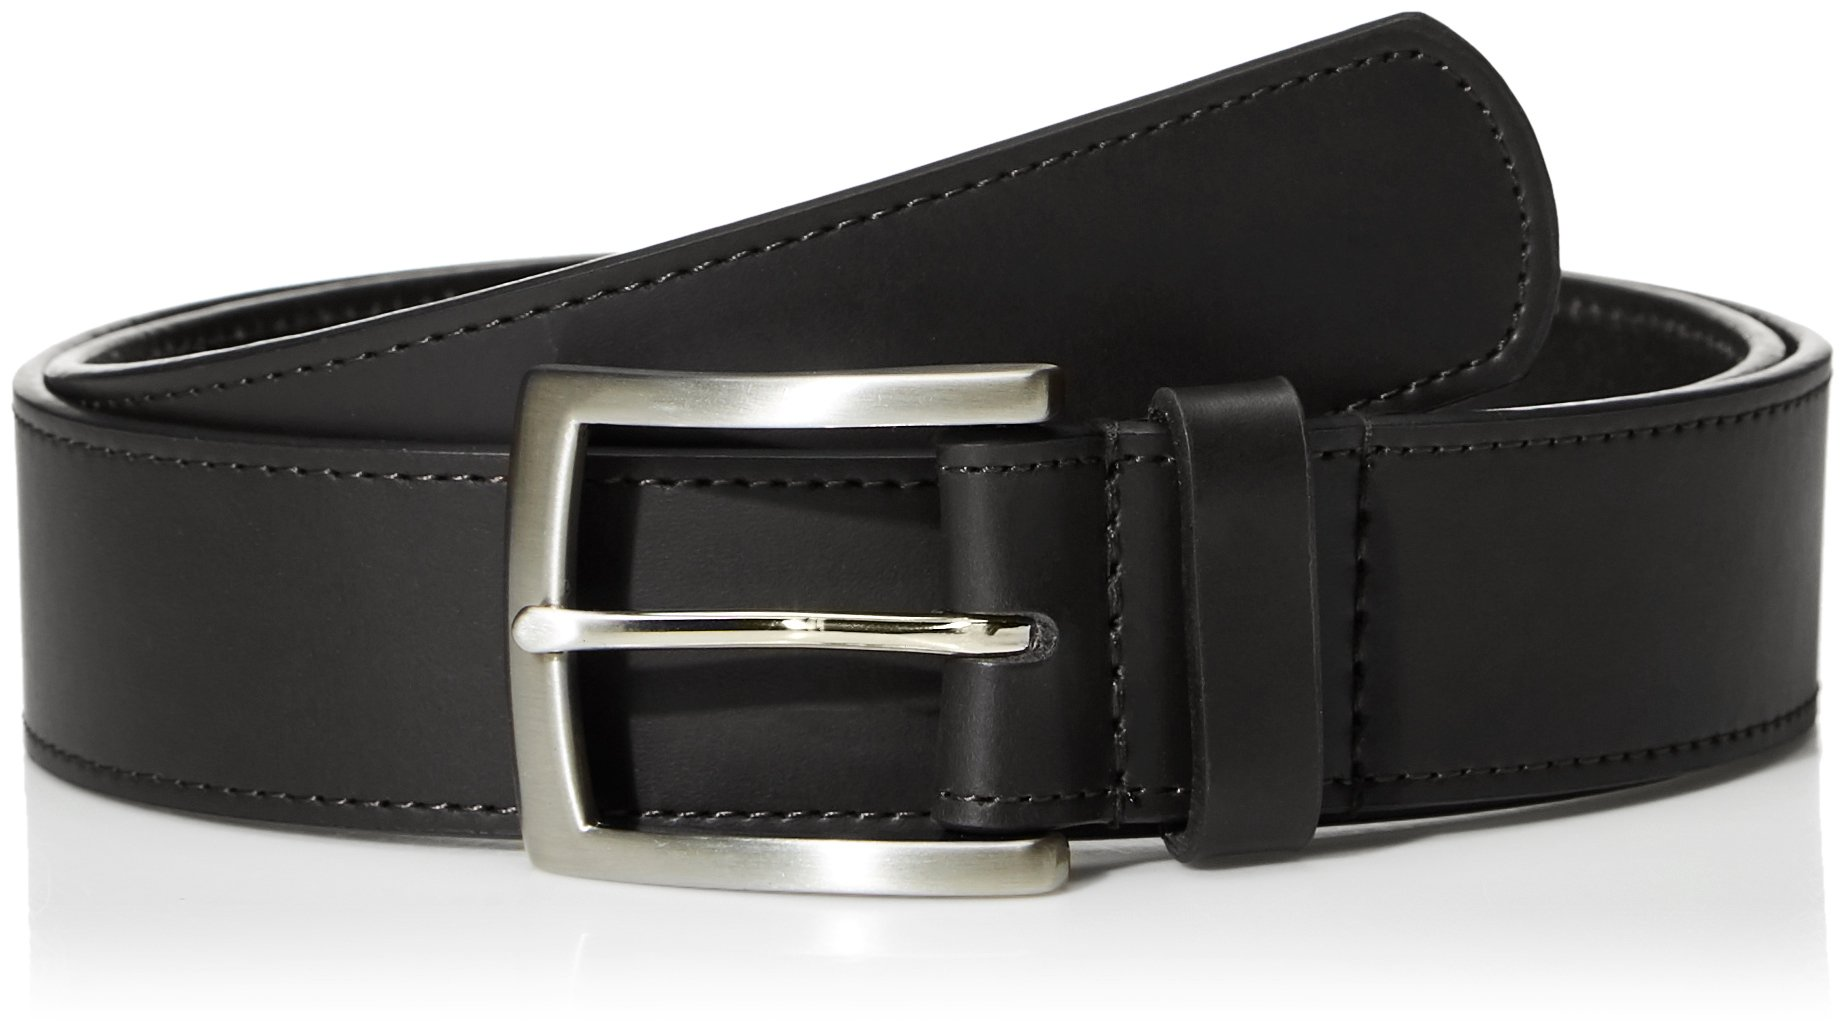 Filgate Genuine Leather Belt Decorative Waistband Black 38'' by Filgate (Image #1)